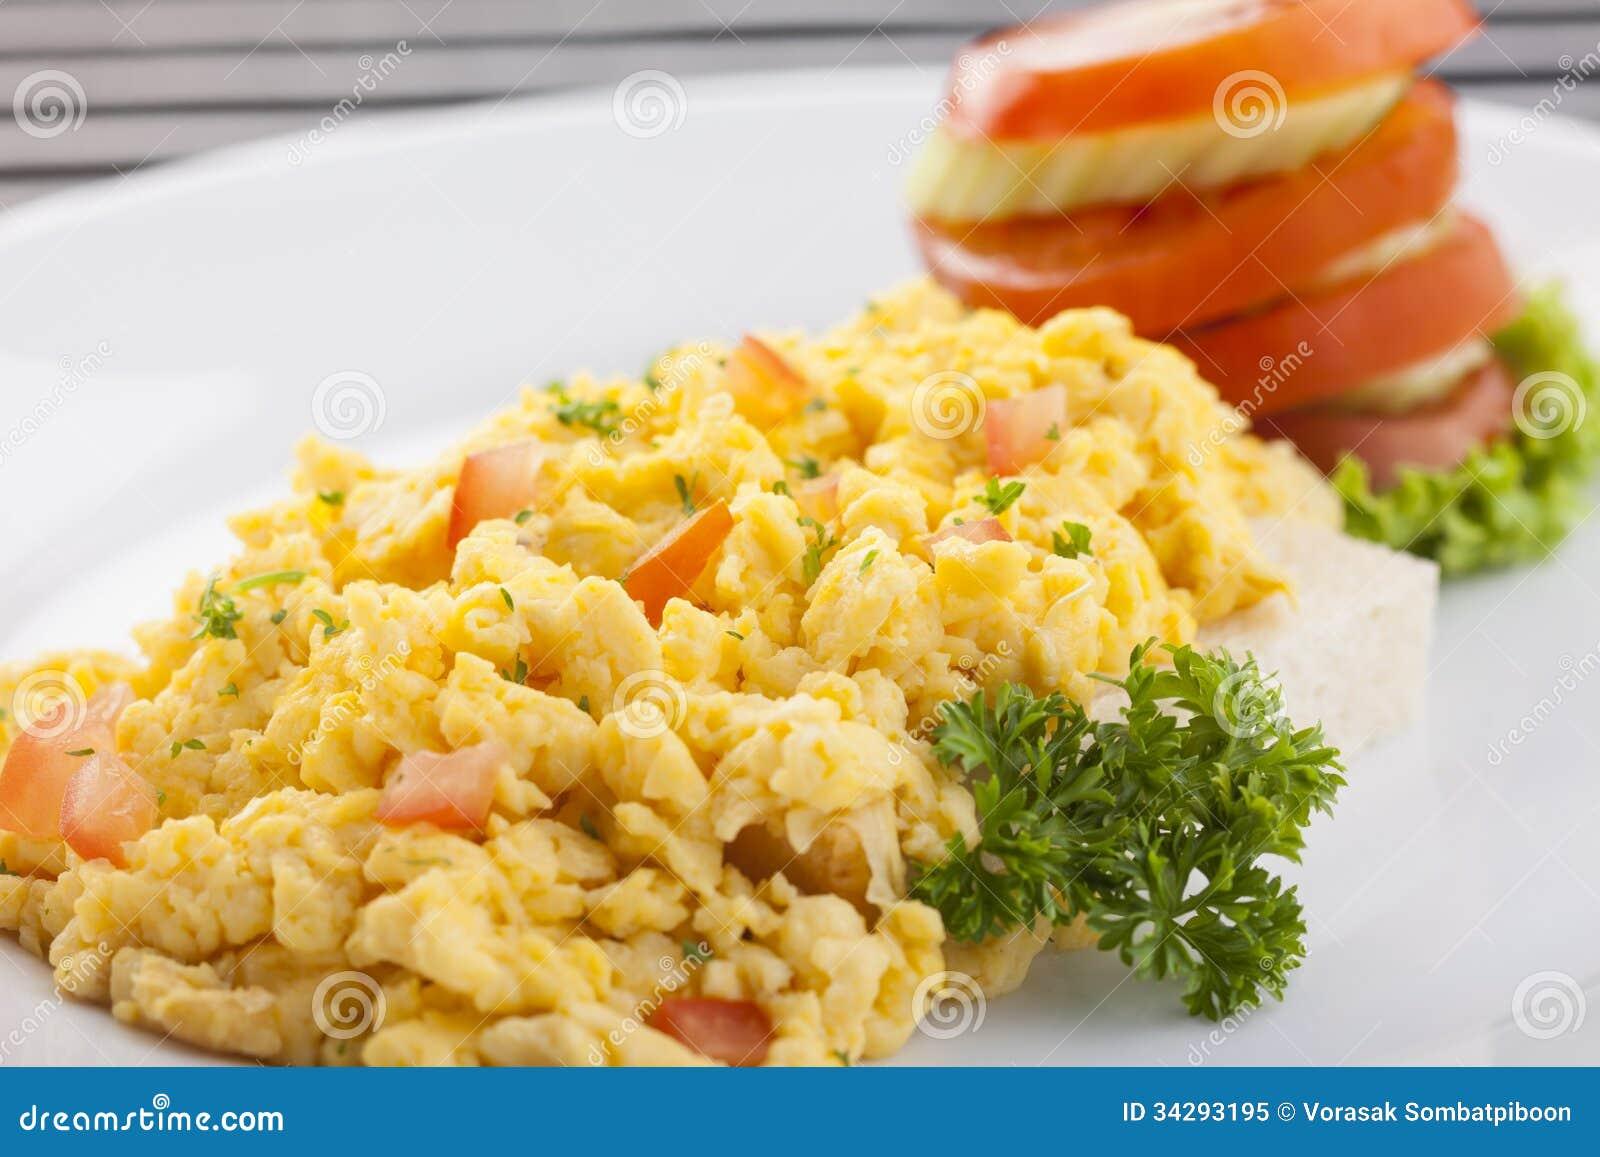 Scramble Egg Royalty Free Stock Photo - Image: 34293195